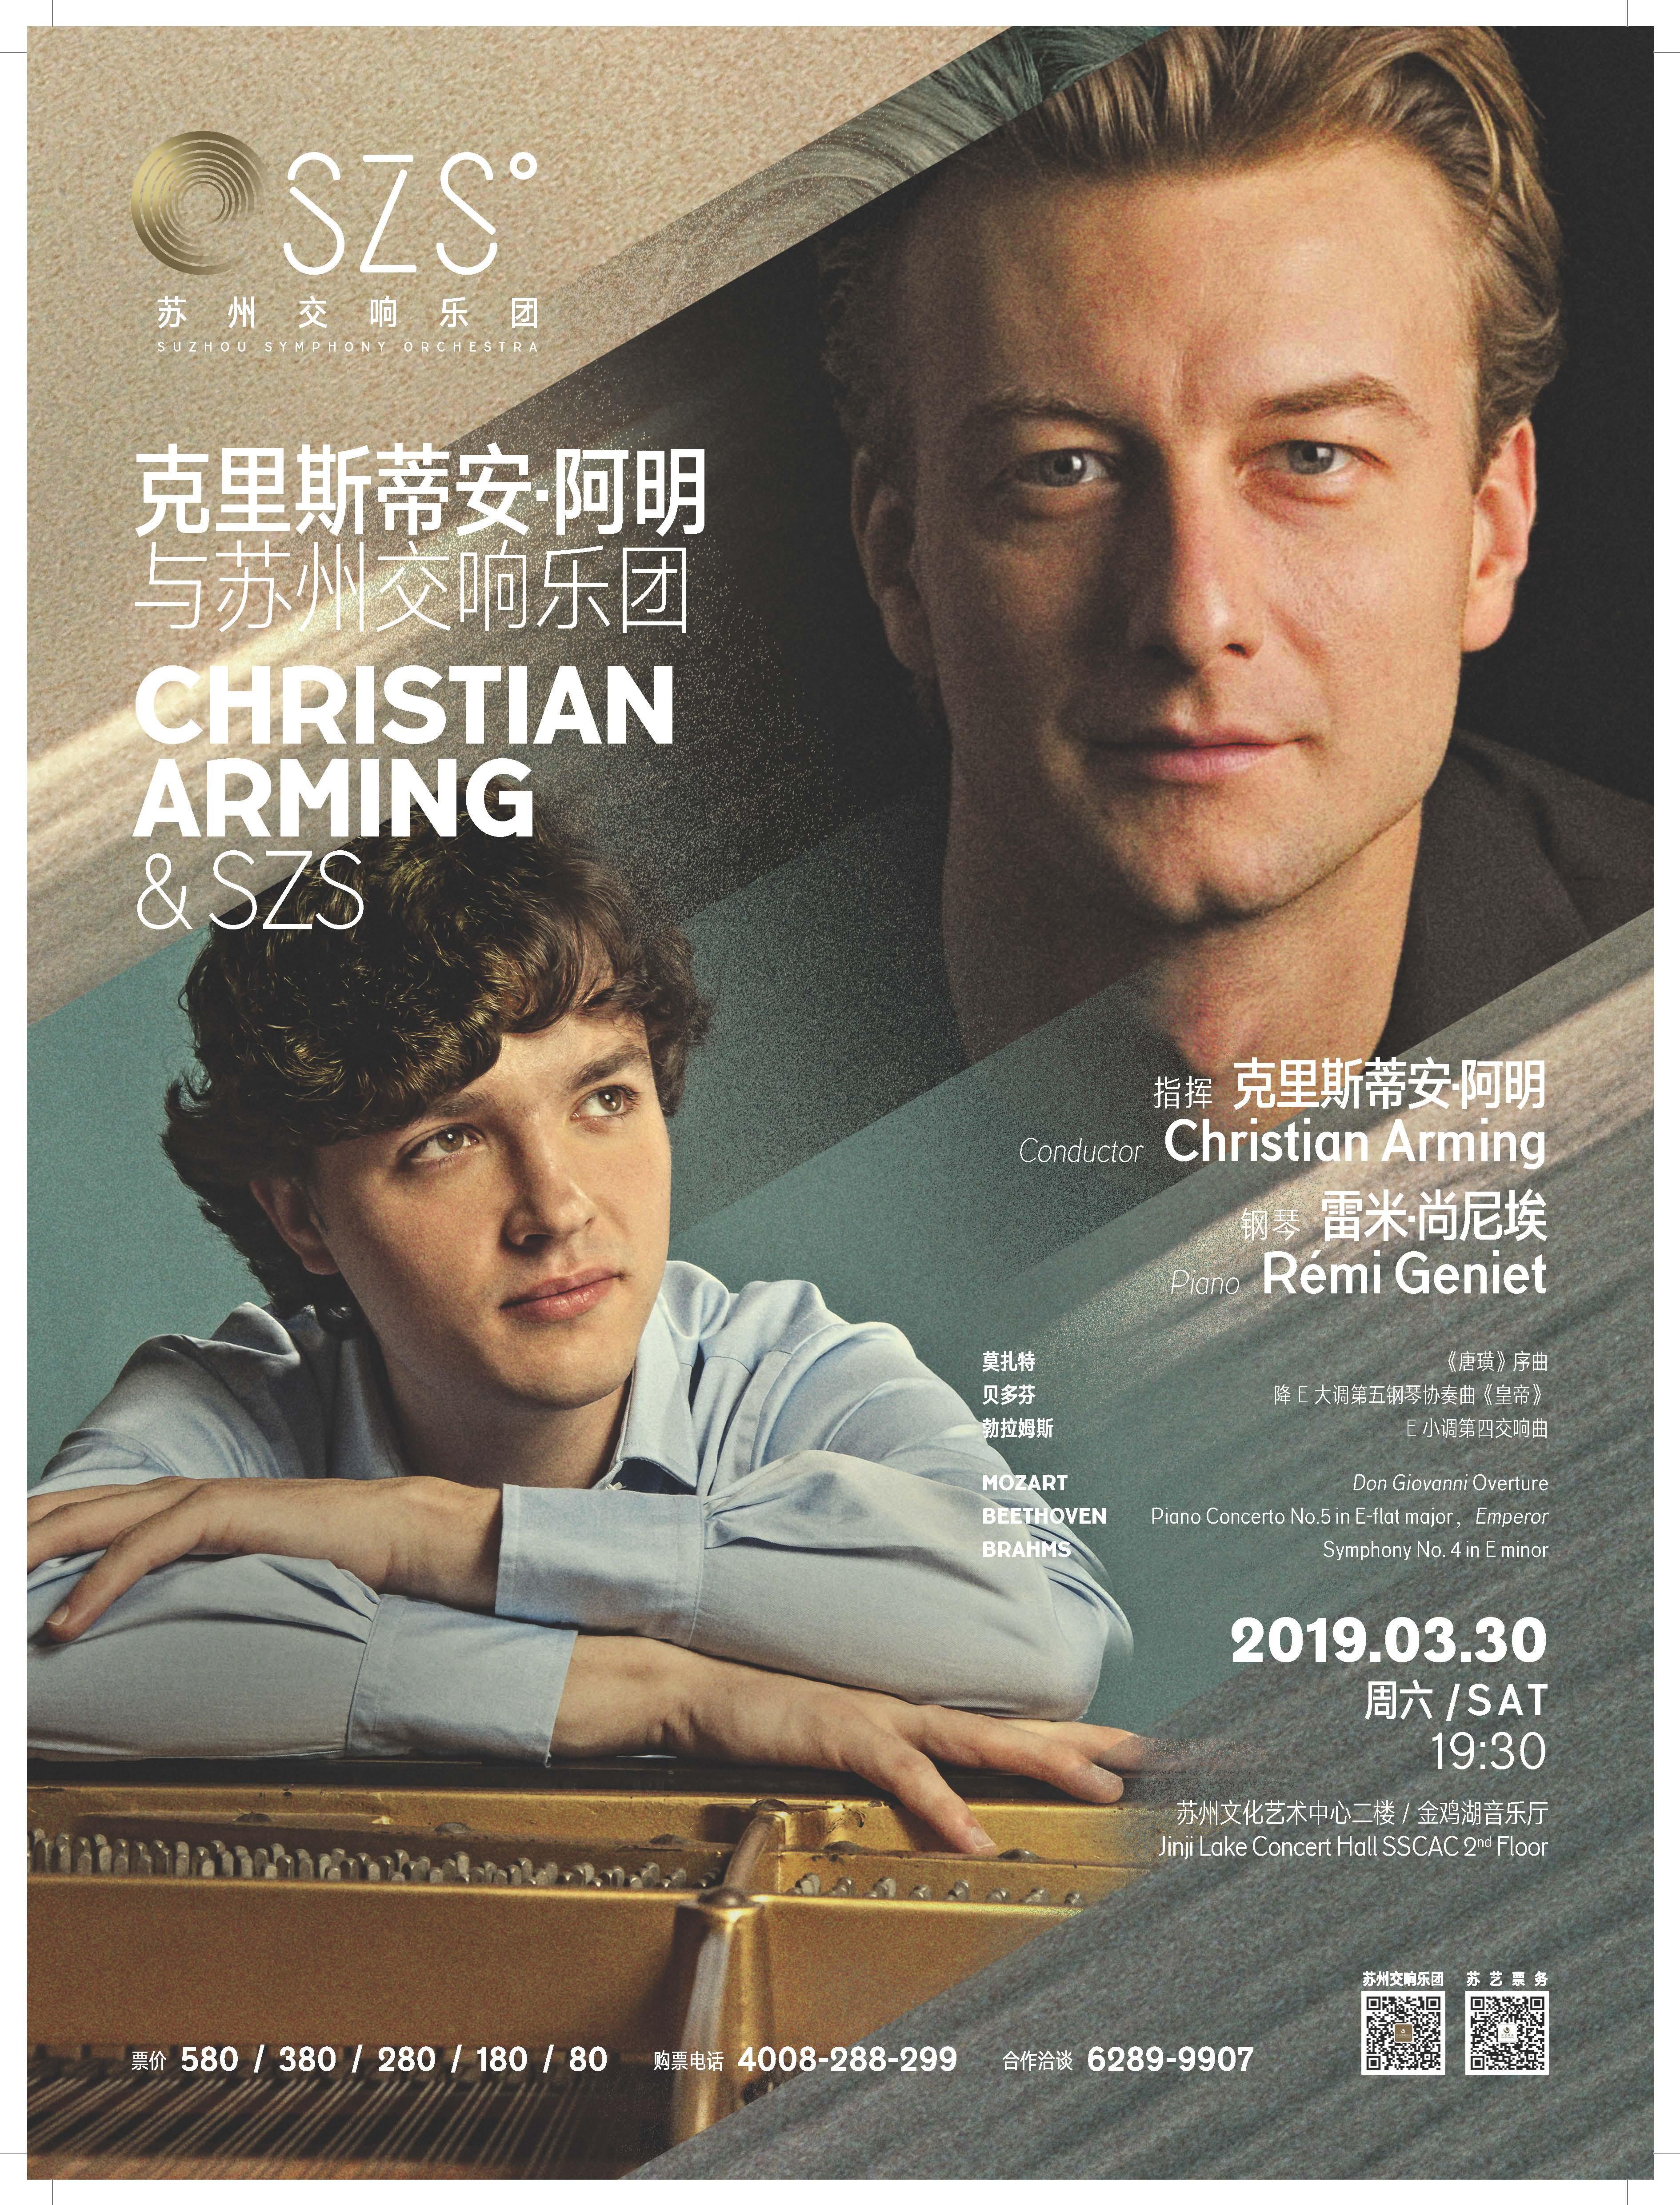 SZS 2018/19 SEASON–克里斯蒂安·阿明与苏州交响乐团(主办)